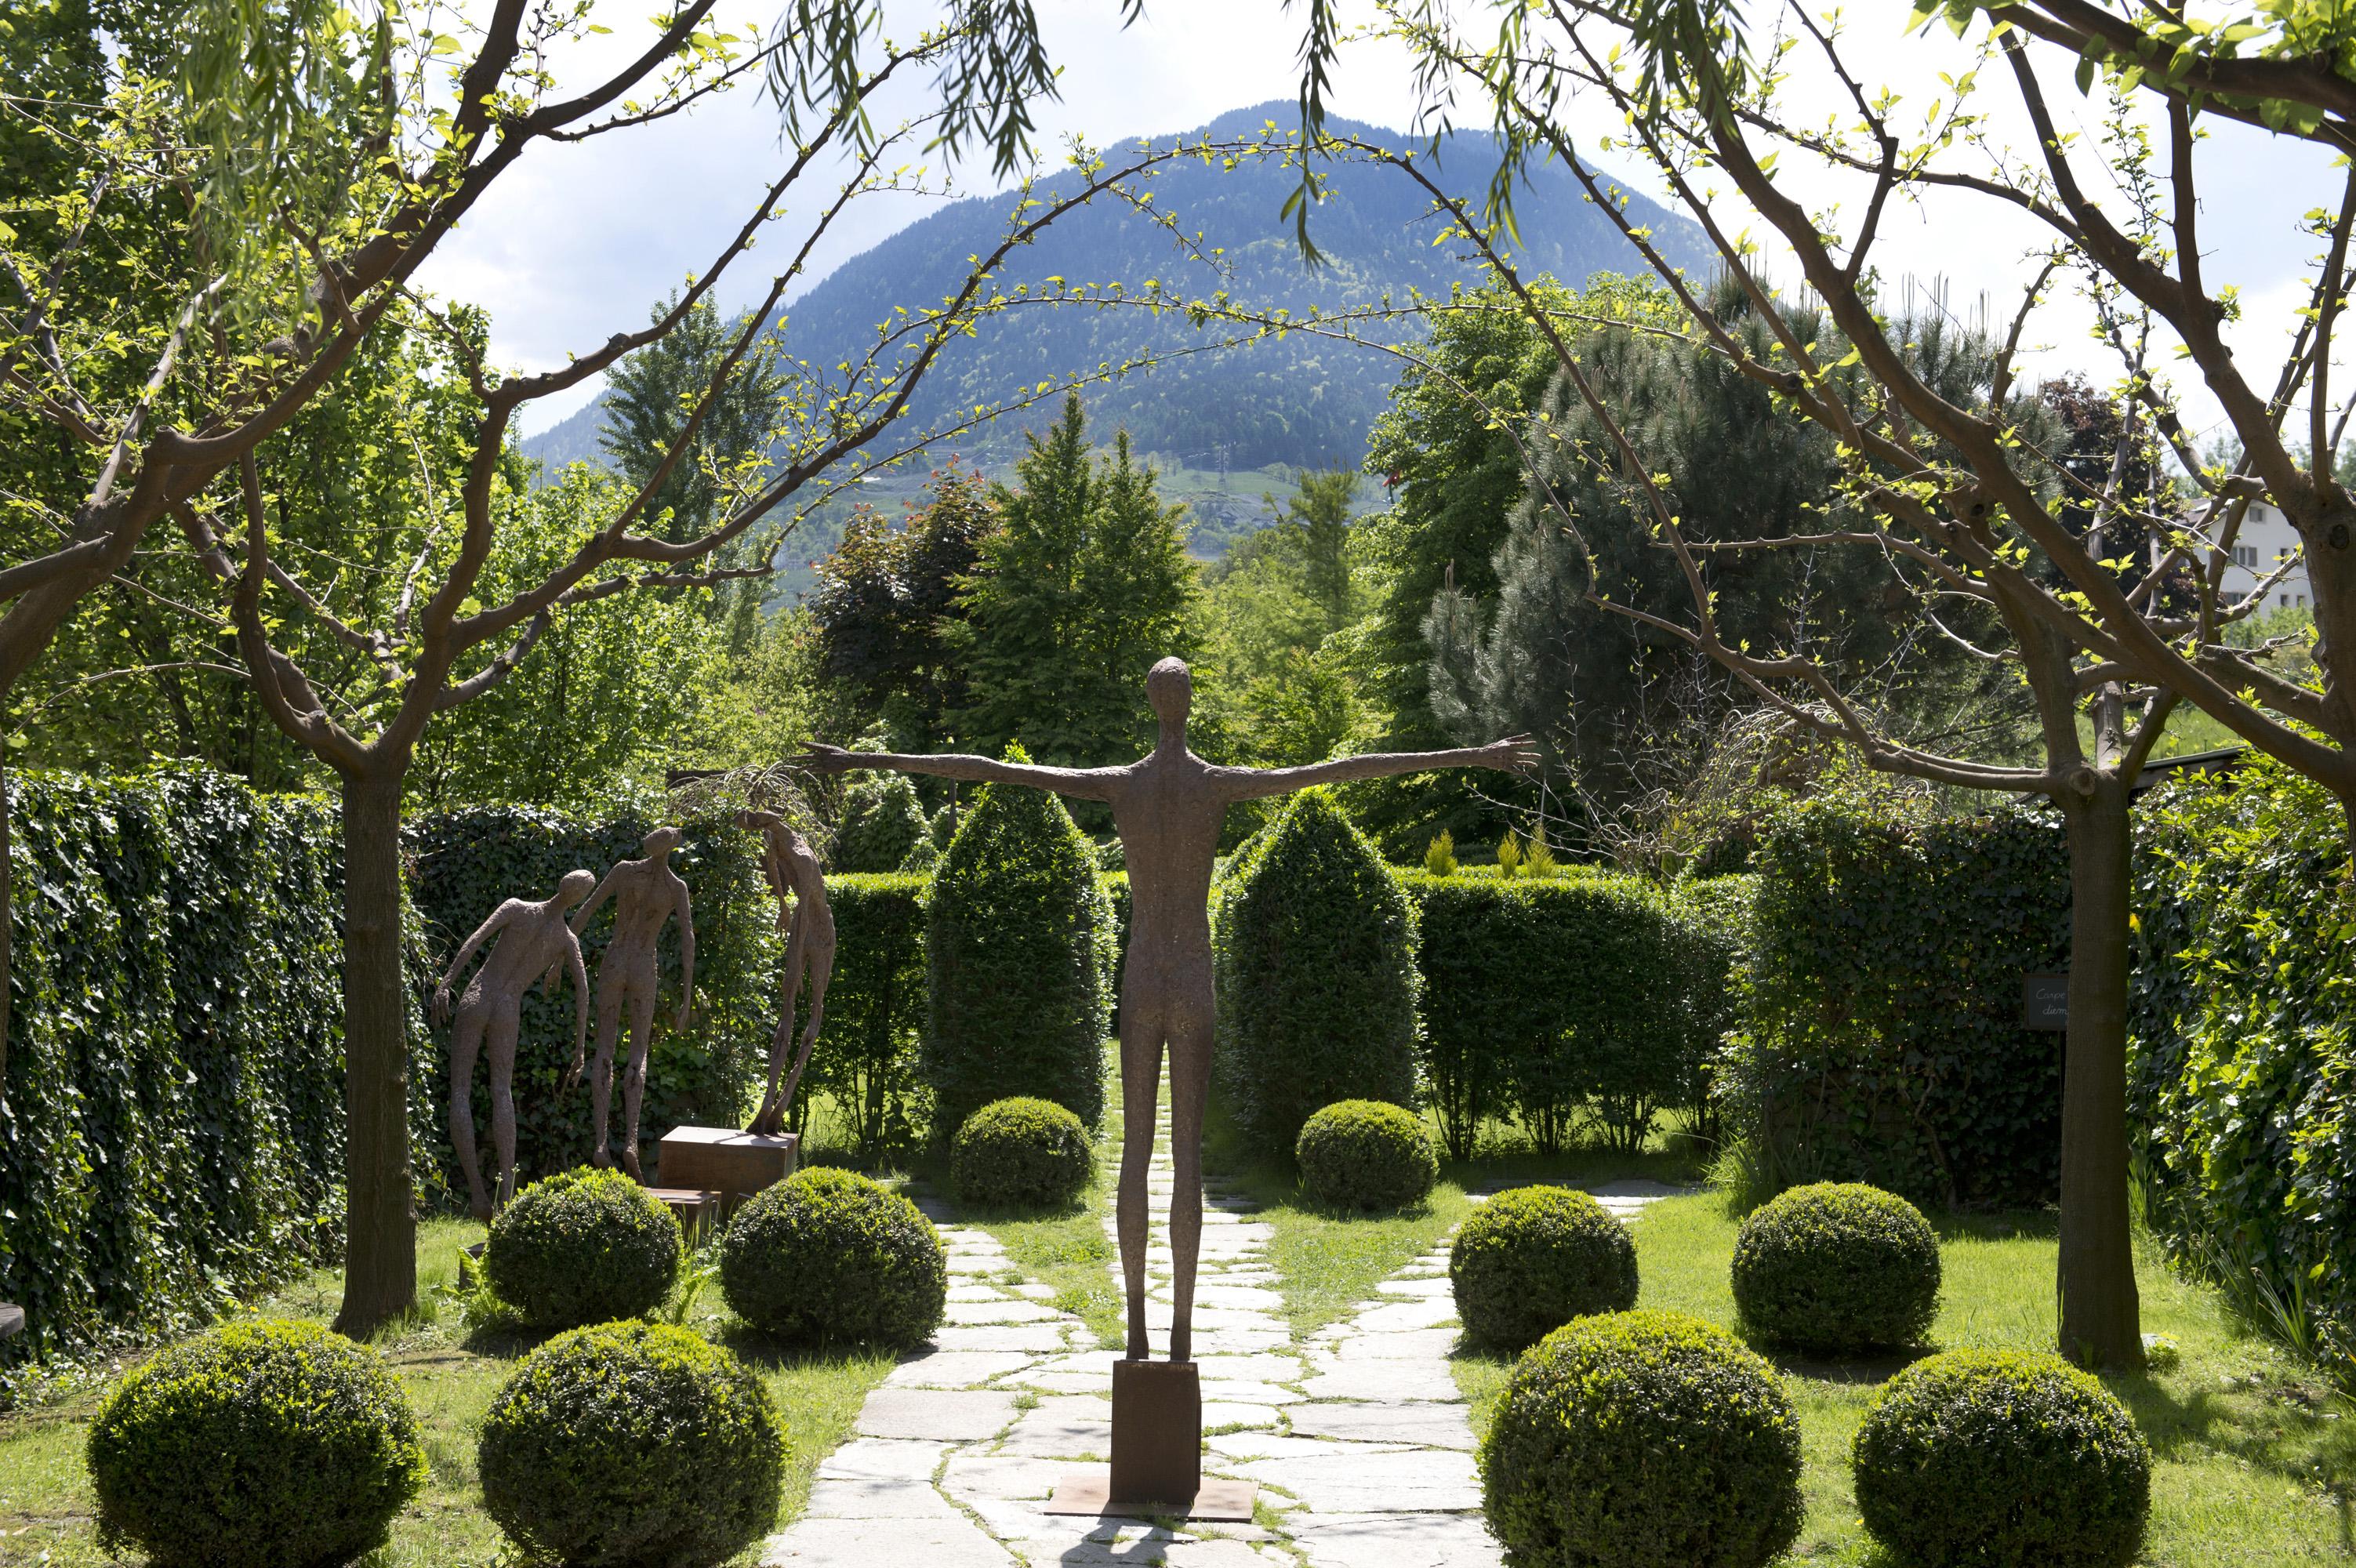 Meditare in un labirinto verde: il Giardino Kränzelhof, a Cermes, in Alto Adige